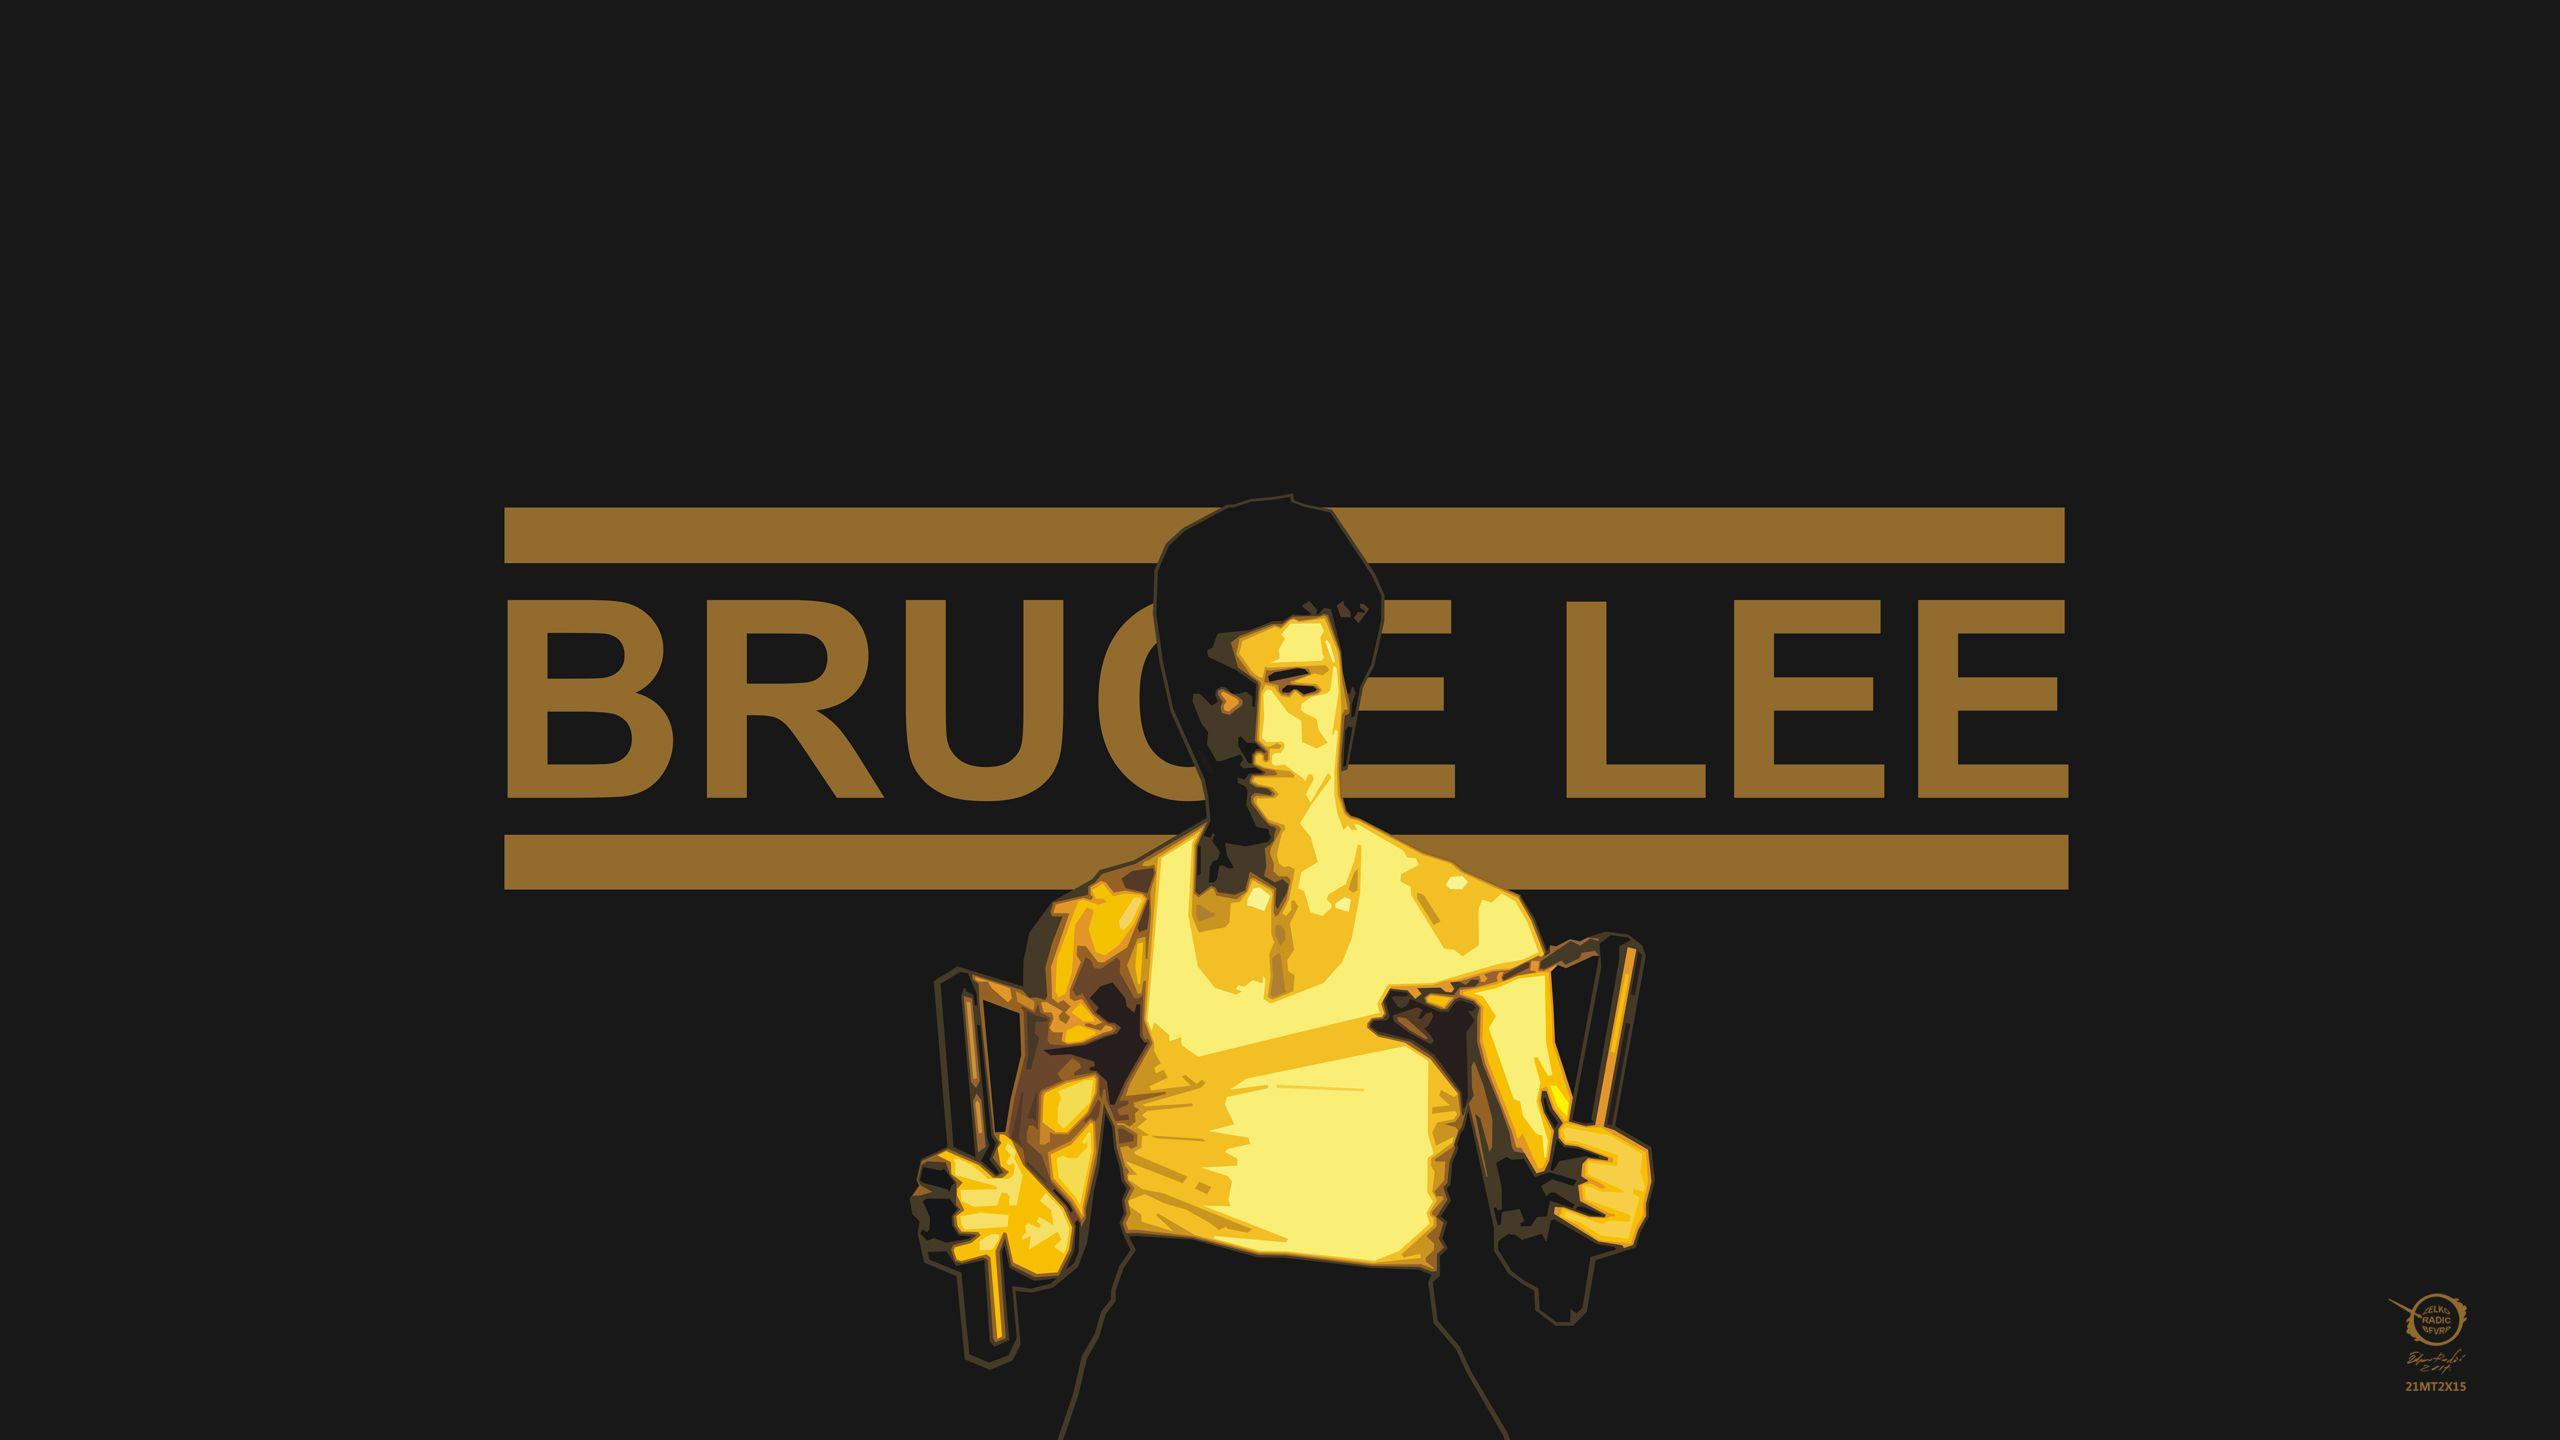 Bruce Lee Vectors Google Search Bruce Lee Iphone Wallpaper Cover Pics